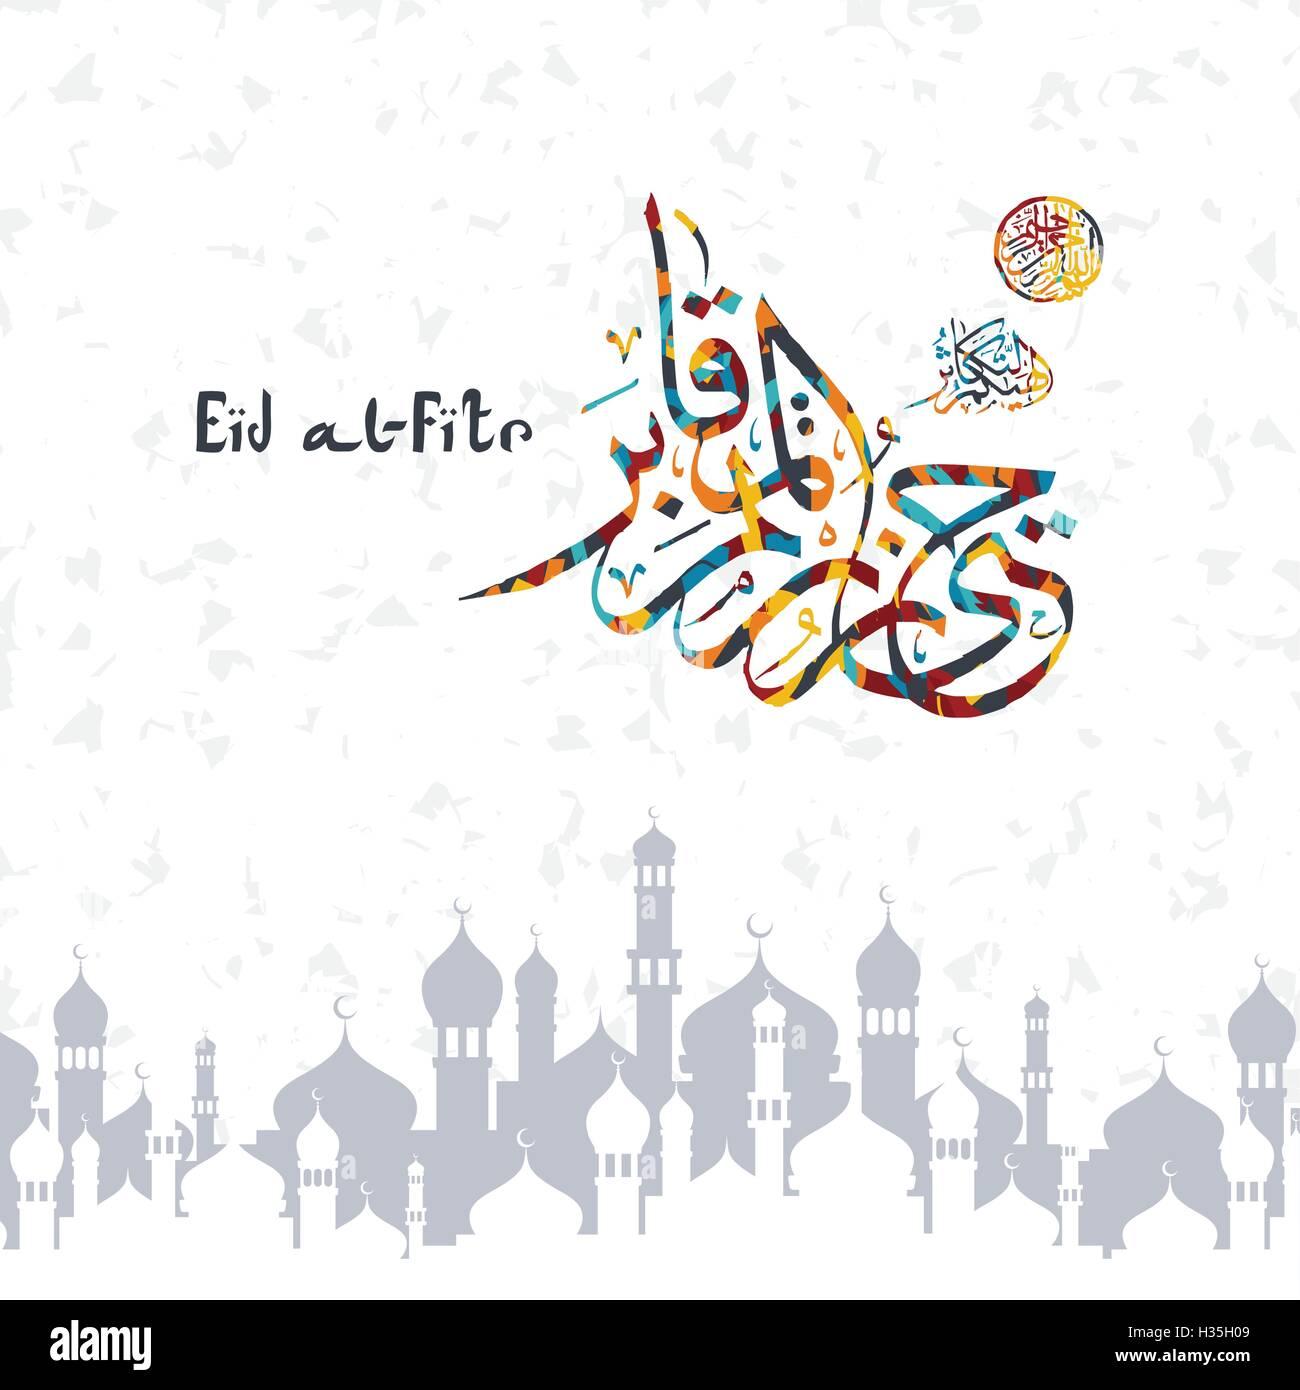 Happy eid mubarak greetings arabic calligraphy art stock vector art happy eid mubarak greetings arabic calligraphy art m4hsunfo Images